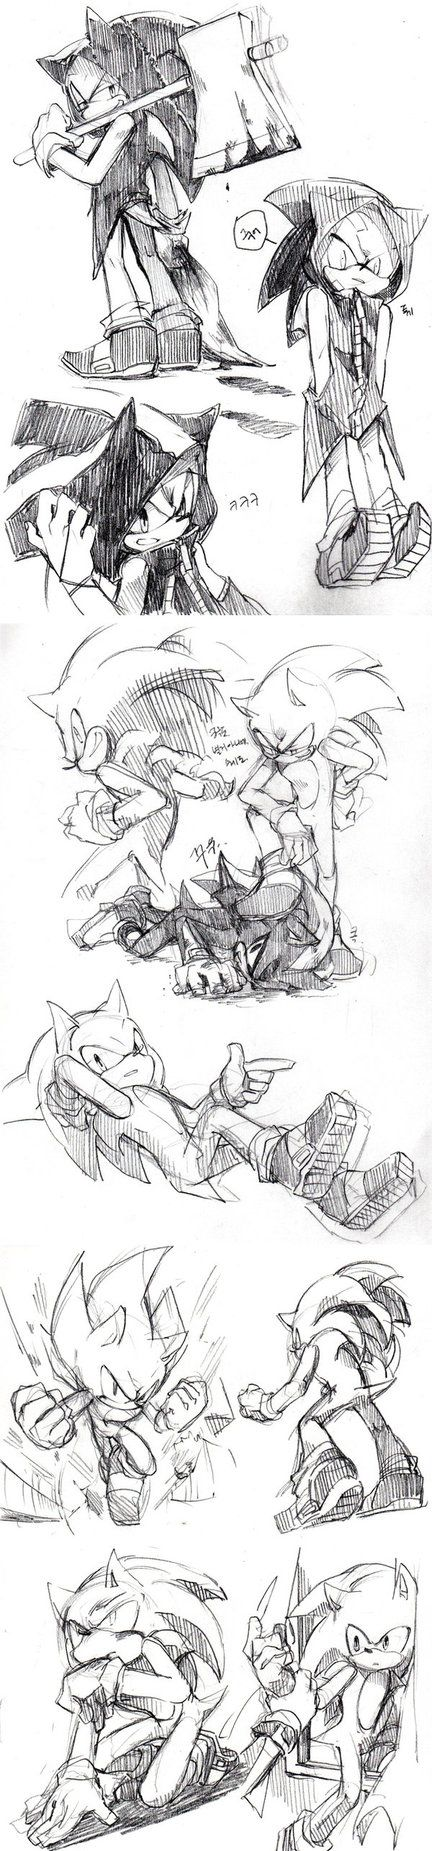 Doodle by Lenmeu